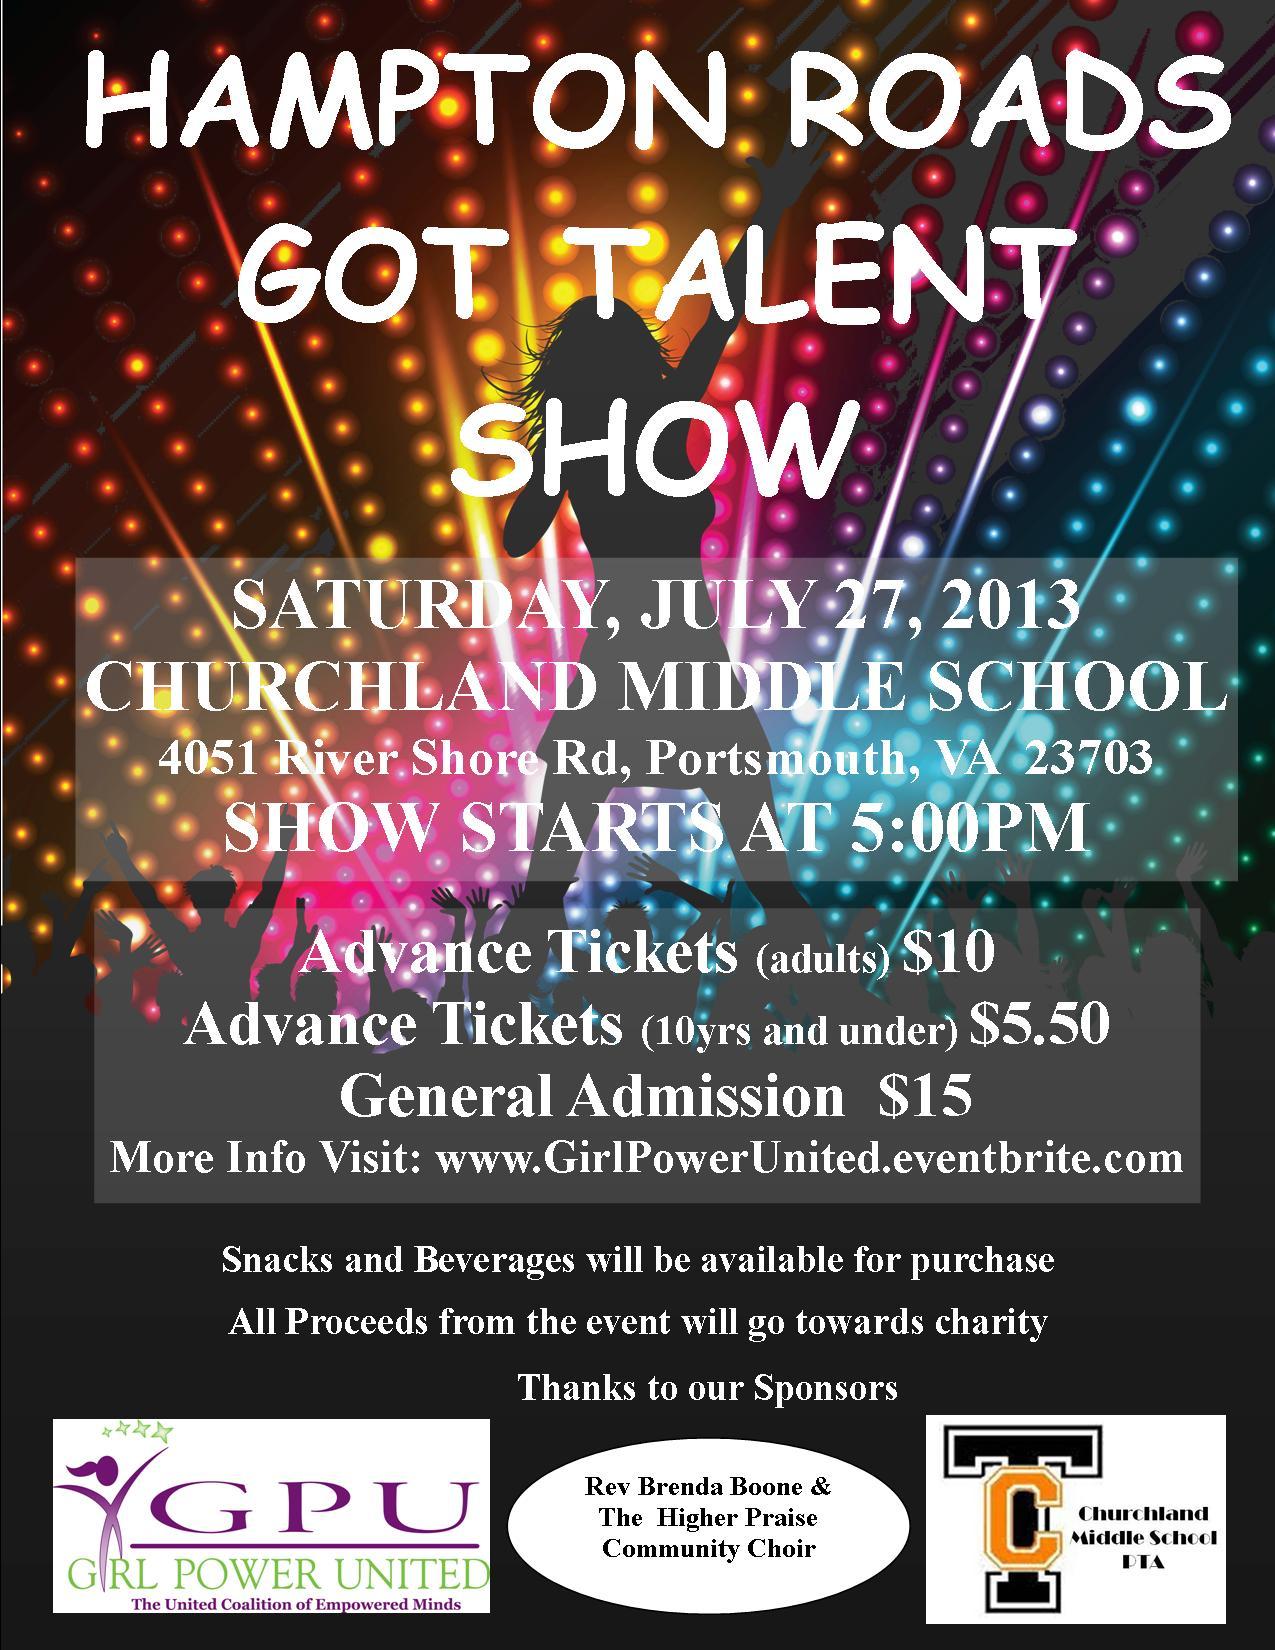 Virginia Nonprofit Girl Power United Inc to Host Hampton Roads Talent Show to Provide